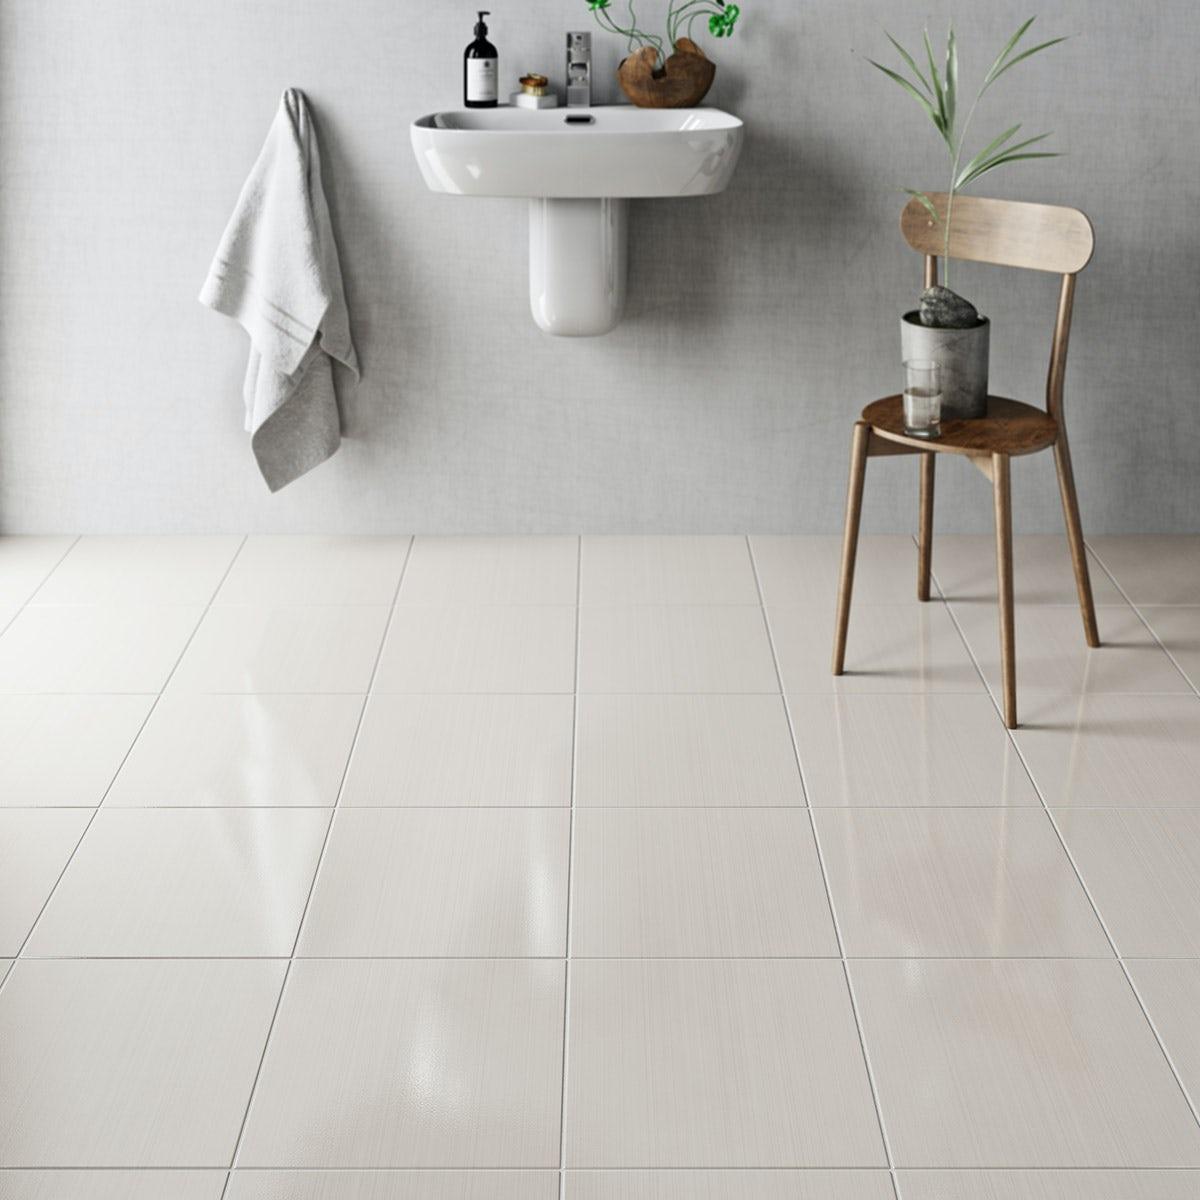 British Ceramic Tile Linear sand beige gloss tile 331mm x 331mm